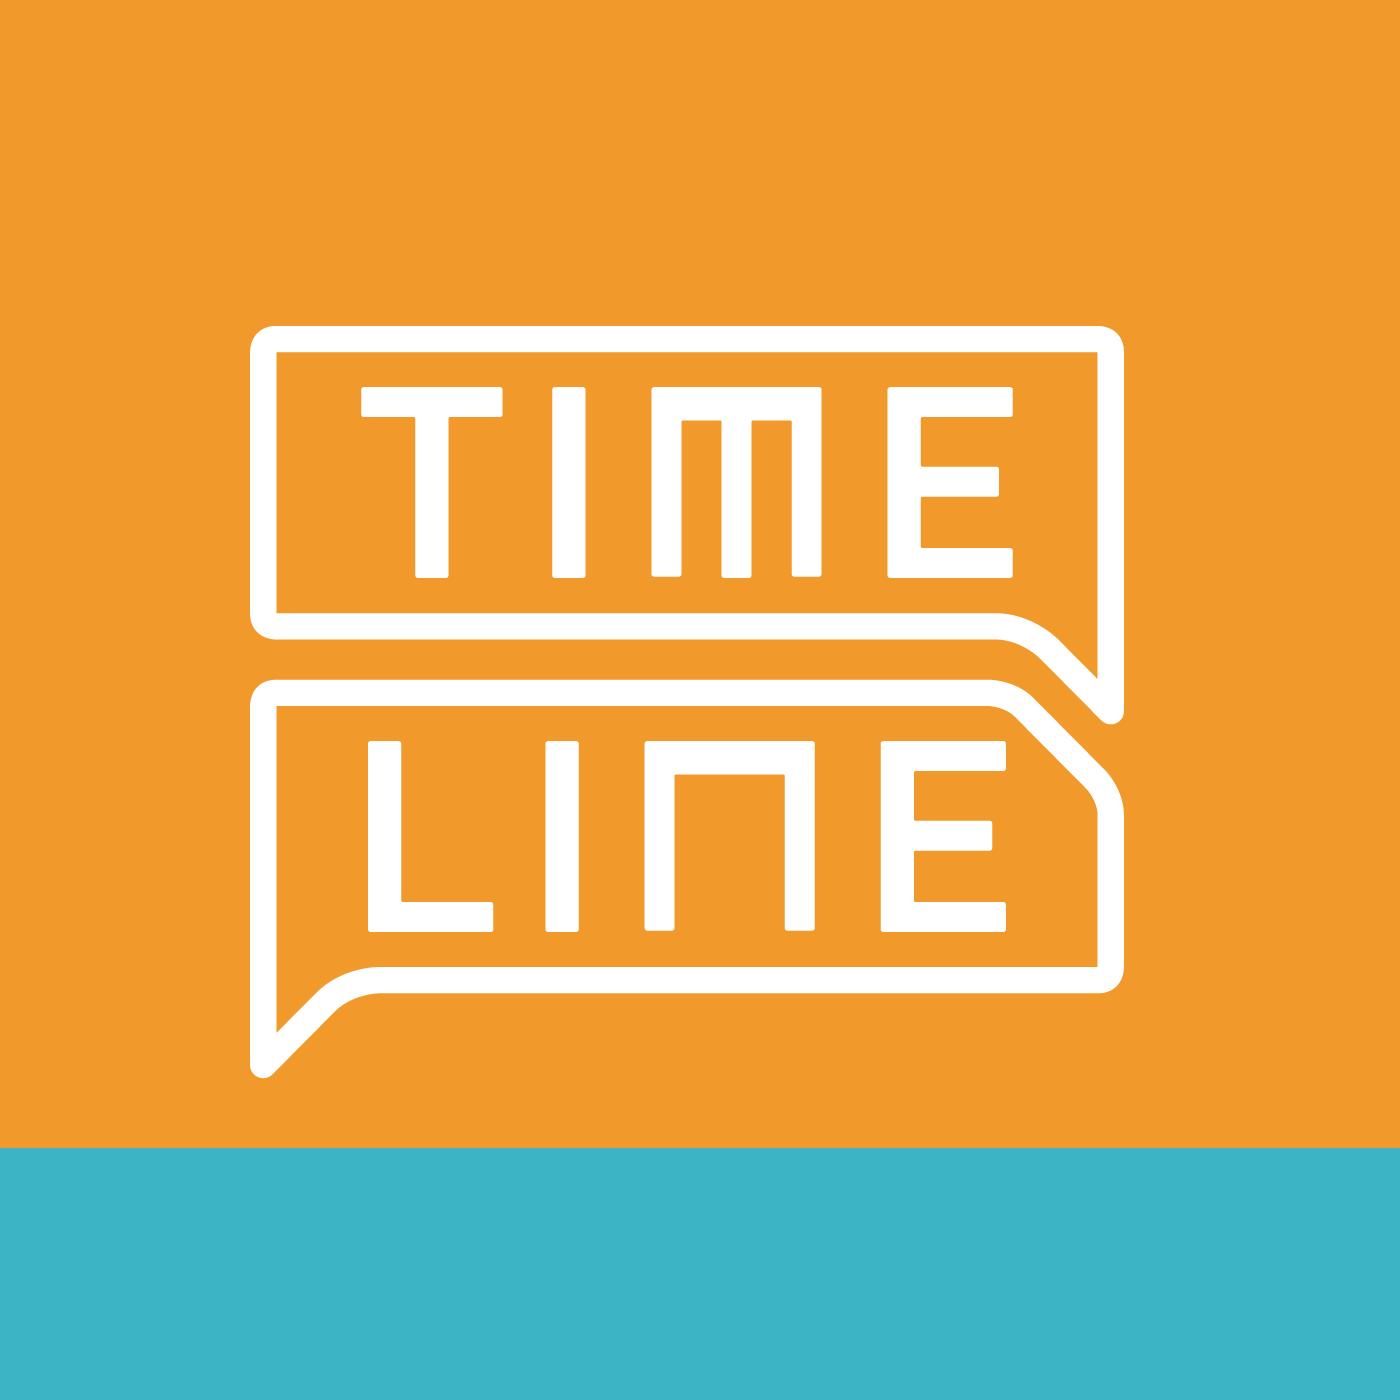 Timeline Gaúcha 19.04.2018